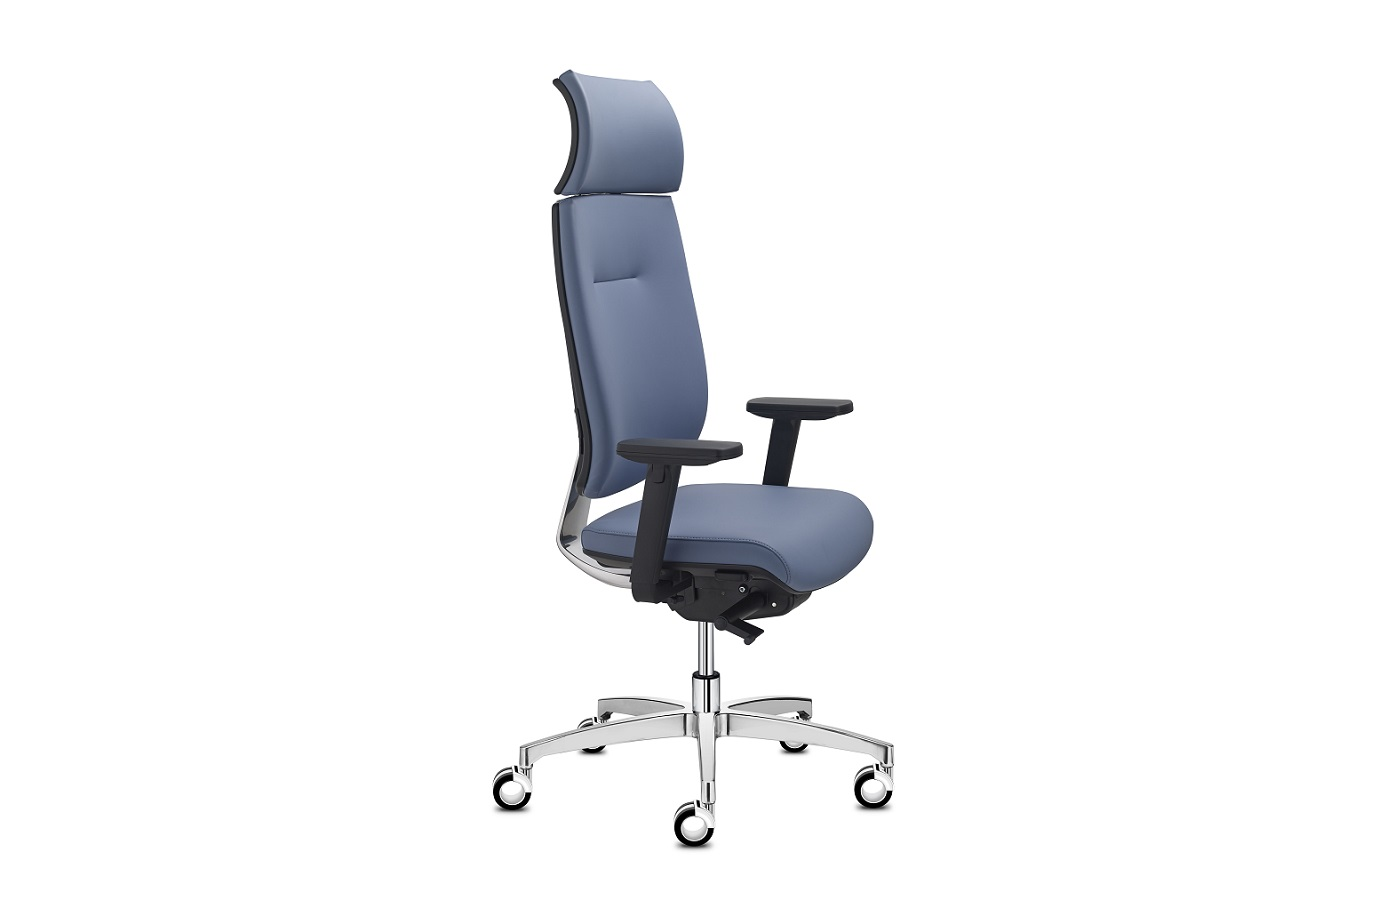 Fresh seduta direzionale ergonomica per ufficio - riganelli